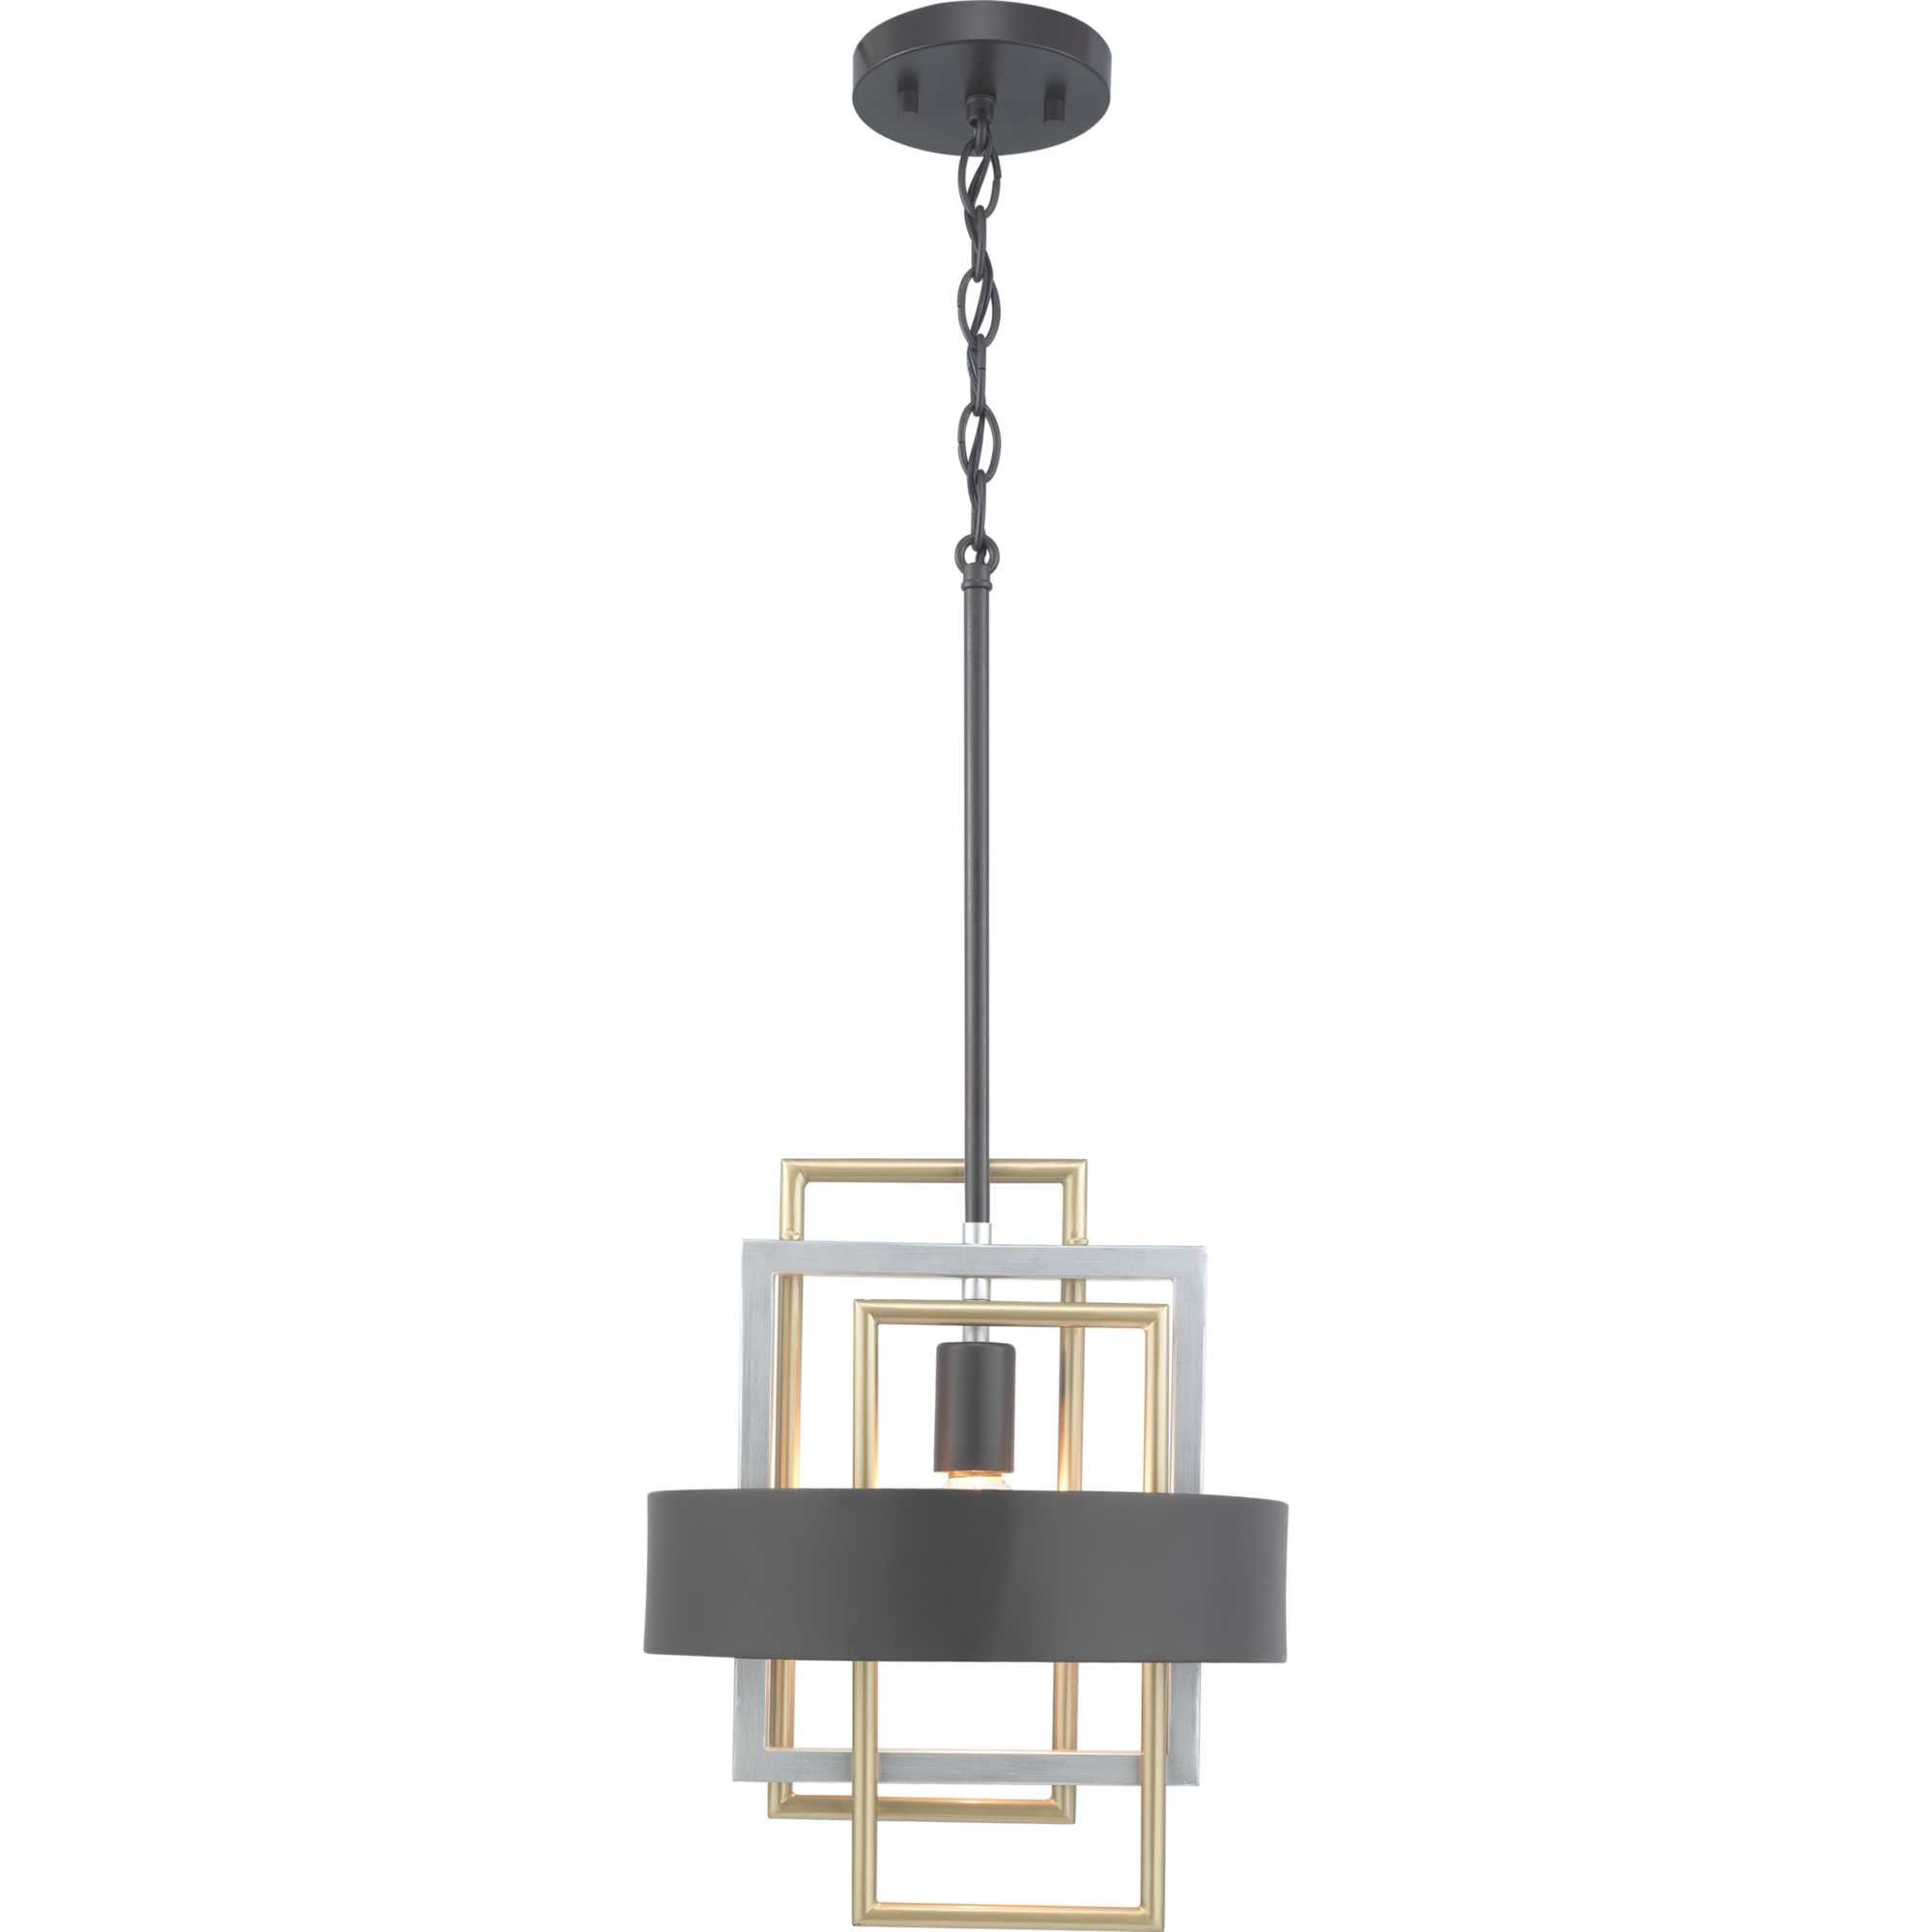 Best And Newest Callington 1 Light Led Single Geometric Pendants Pertaining To Coralie 1 Light Geometric Pendant (View 3 of 25)